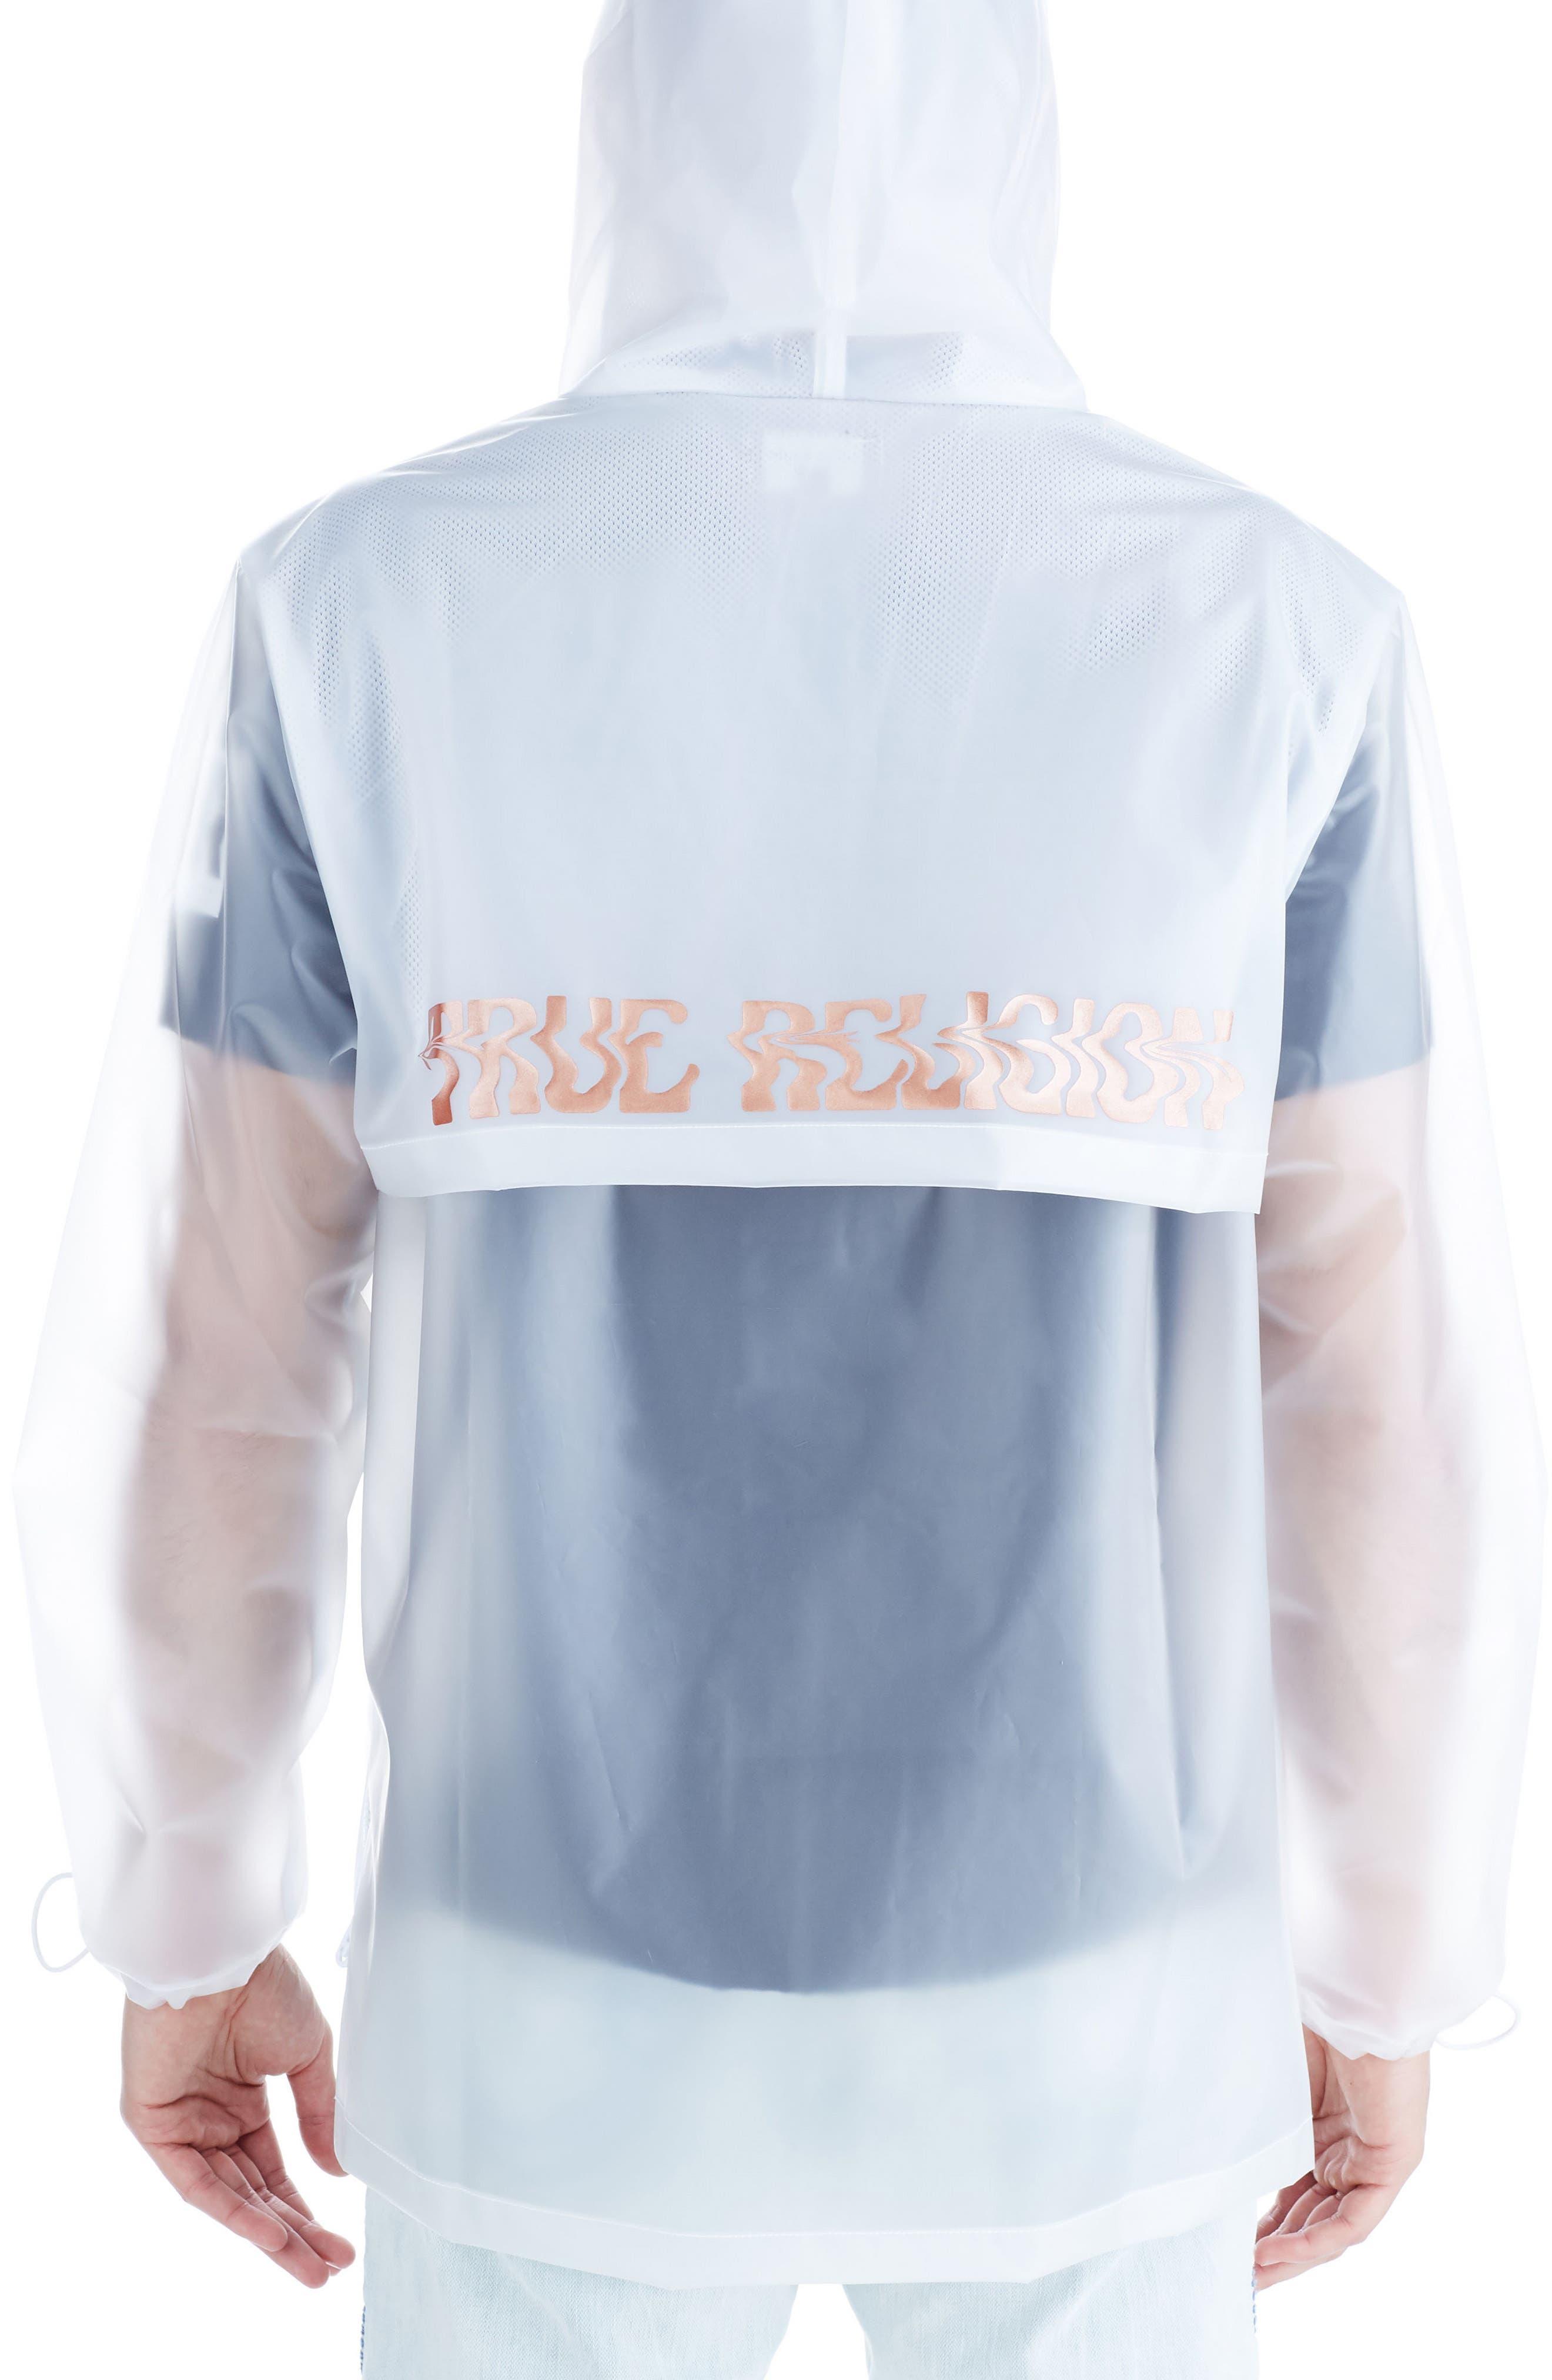 Translucent Rain Jacket,                             Alternate thumbnail 2, color,                             White